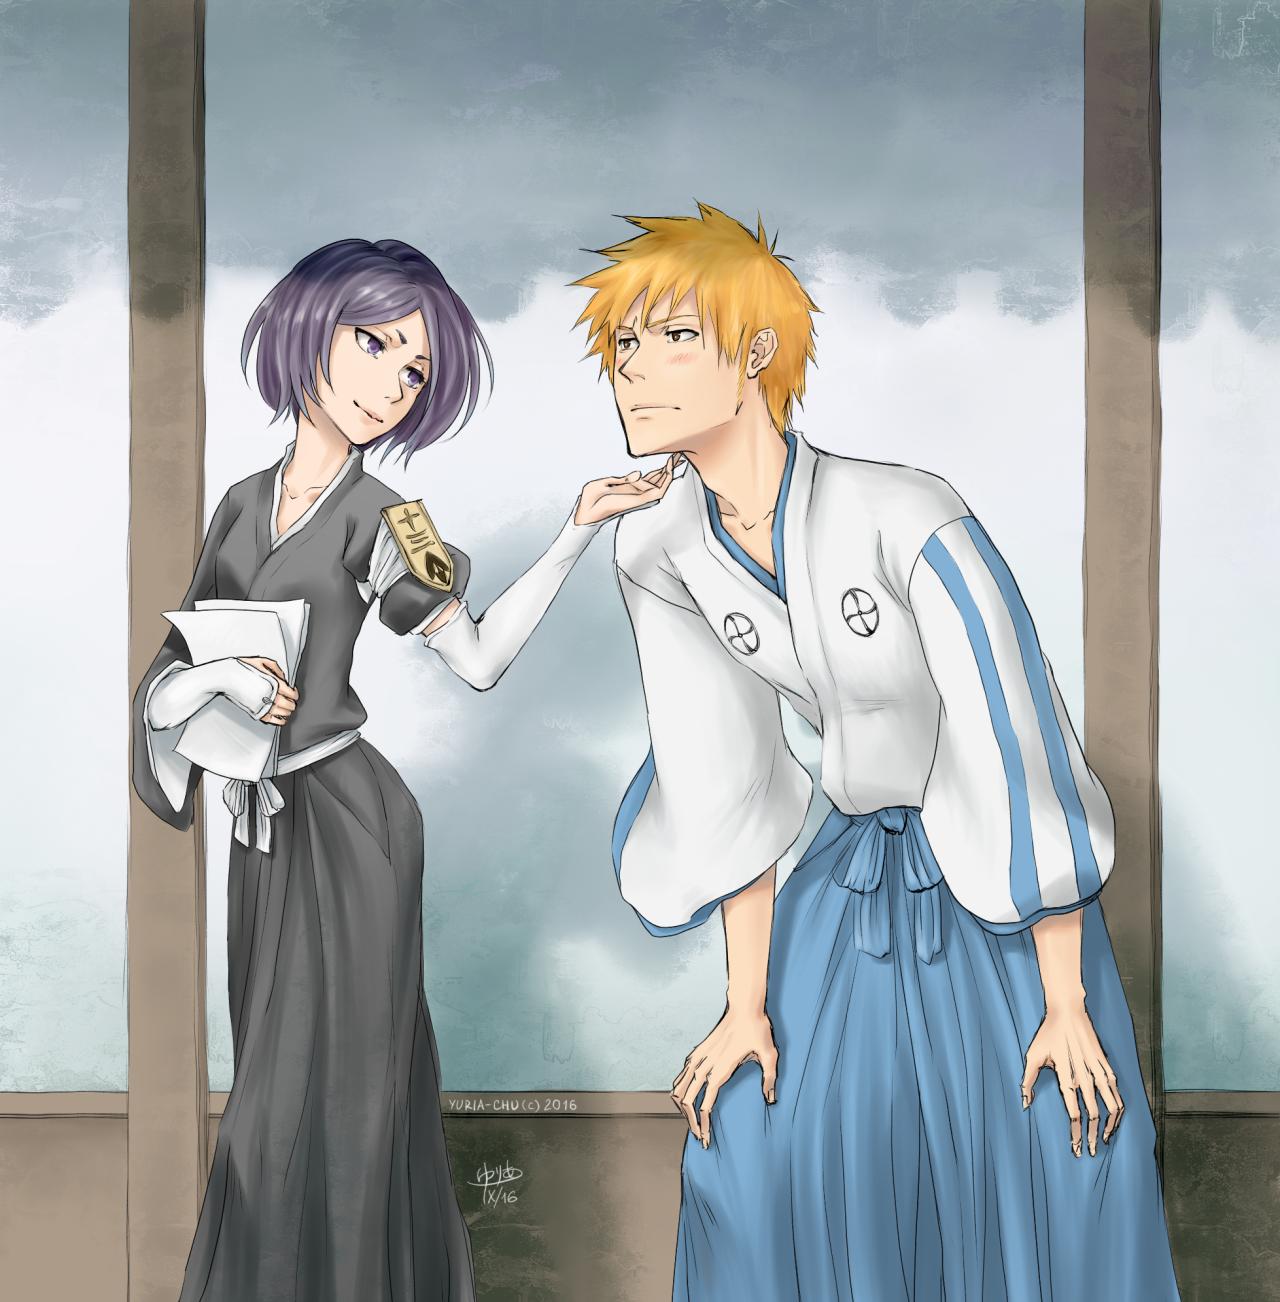 Yuria Sama Ichigo Kurosaki 20 Years Old Hair Color Orange Eye Color Brown Occupation Shin ō Academy Stude Bleach Anime Ichigo And Rukia Bleach Rukia